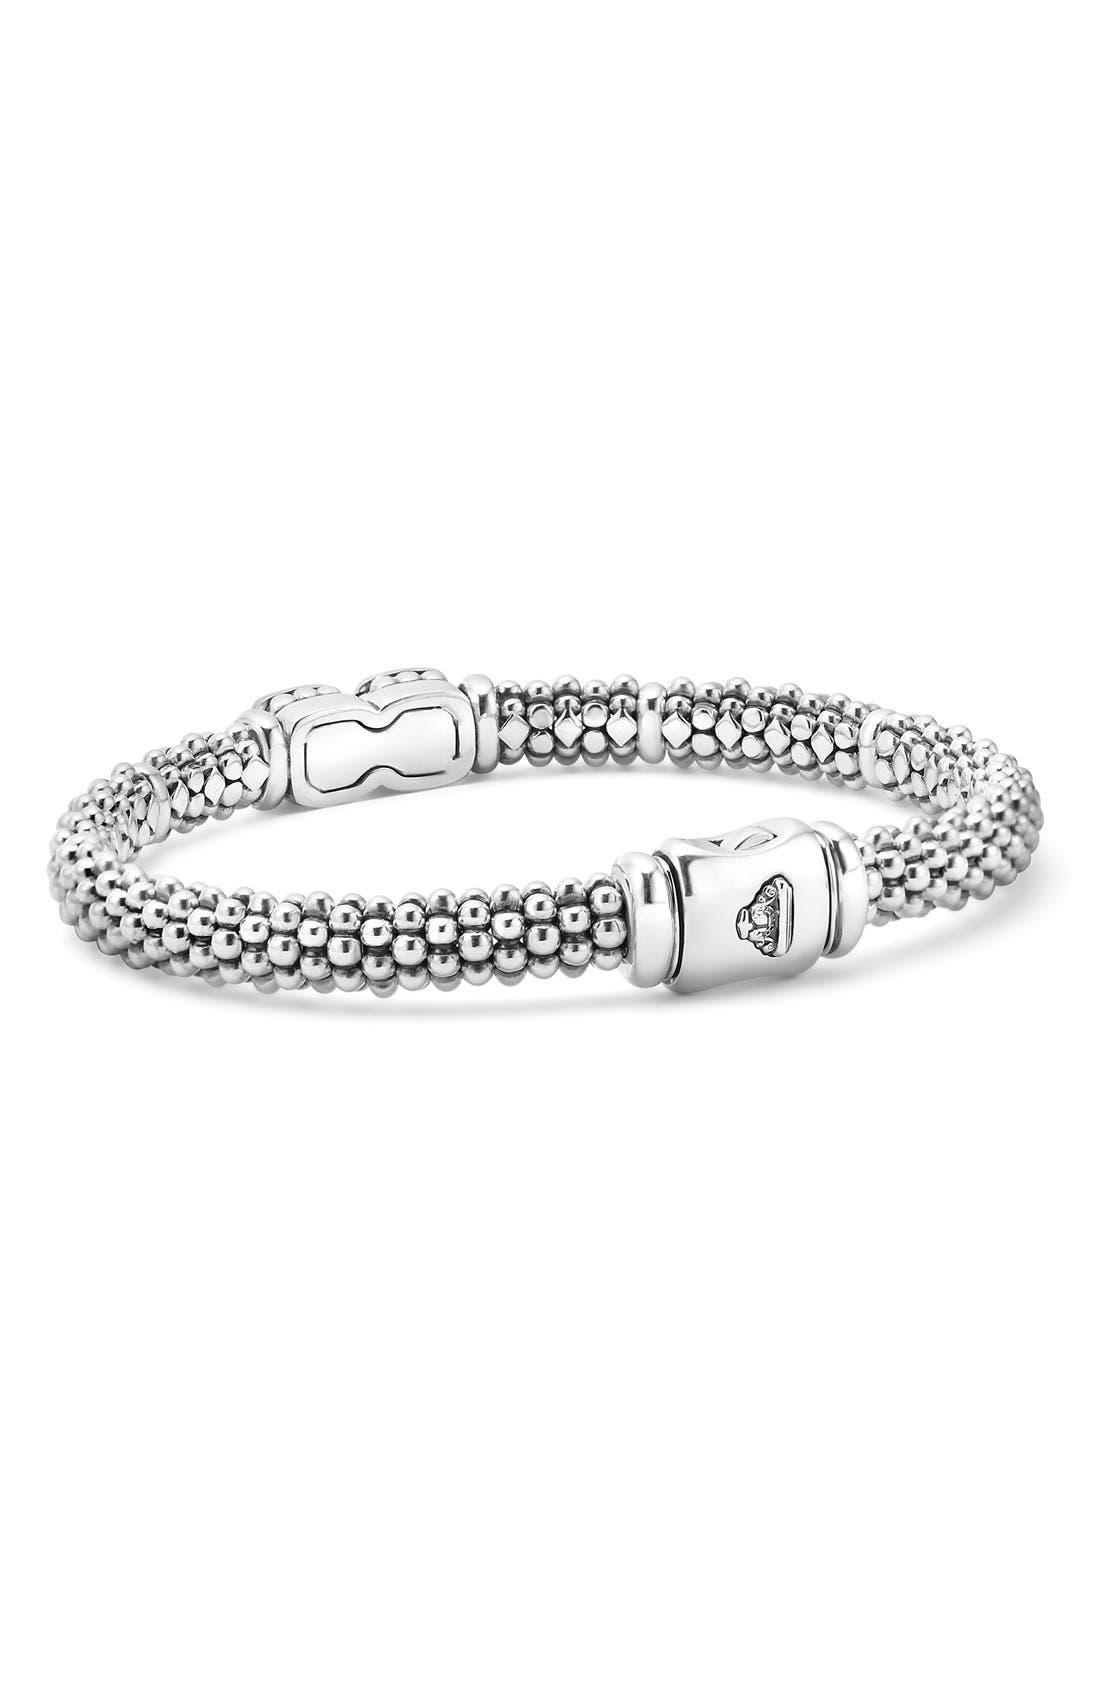 'Cushion' Diamond Caviar Bracelet,                             Alternate thumbnail 3, color,                             SILVER/ GOLD